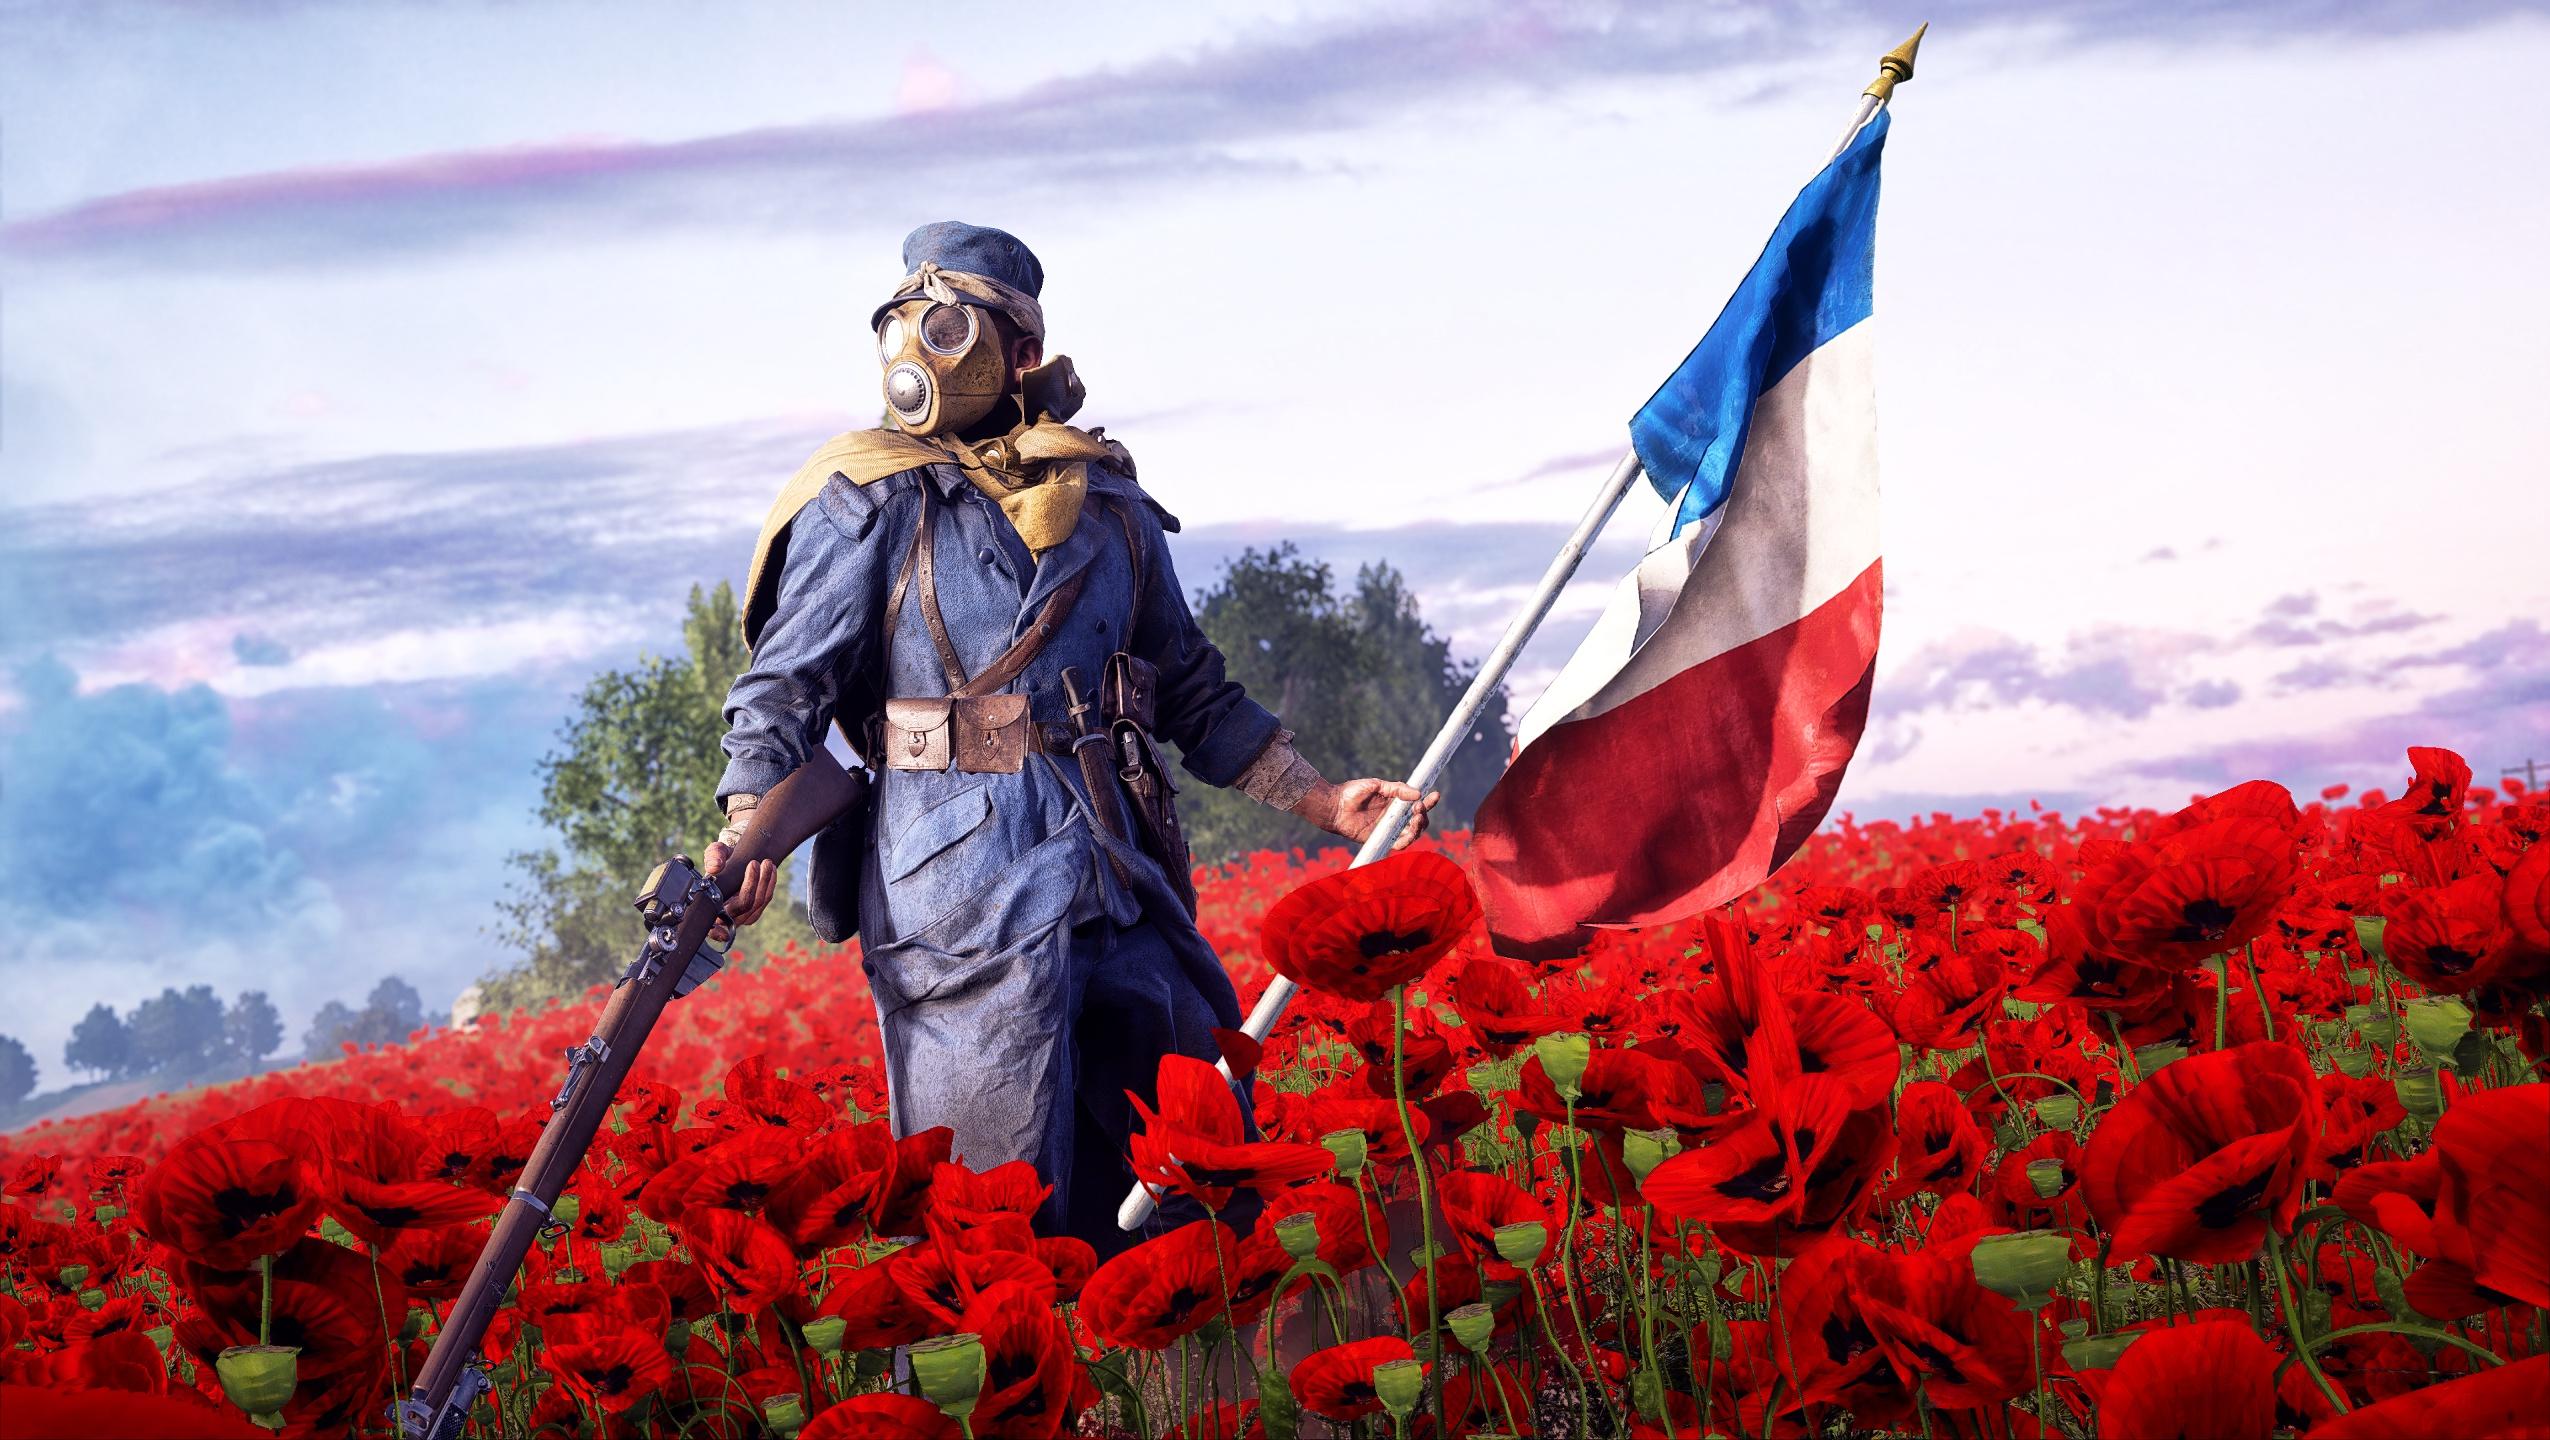 Battlefield 1 hd wallpaper background image 2550x1440 - Battlefield 1 french soldier ...